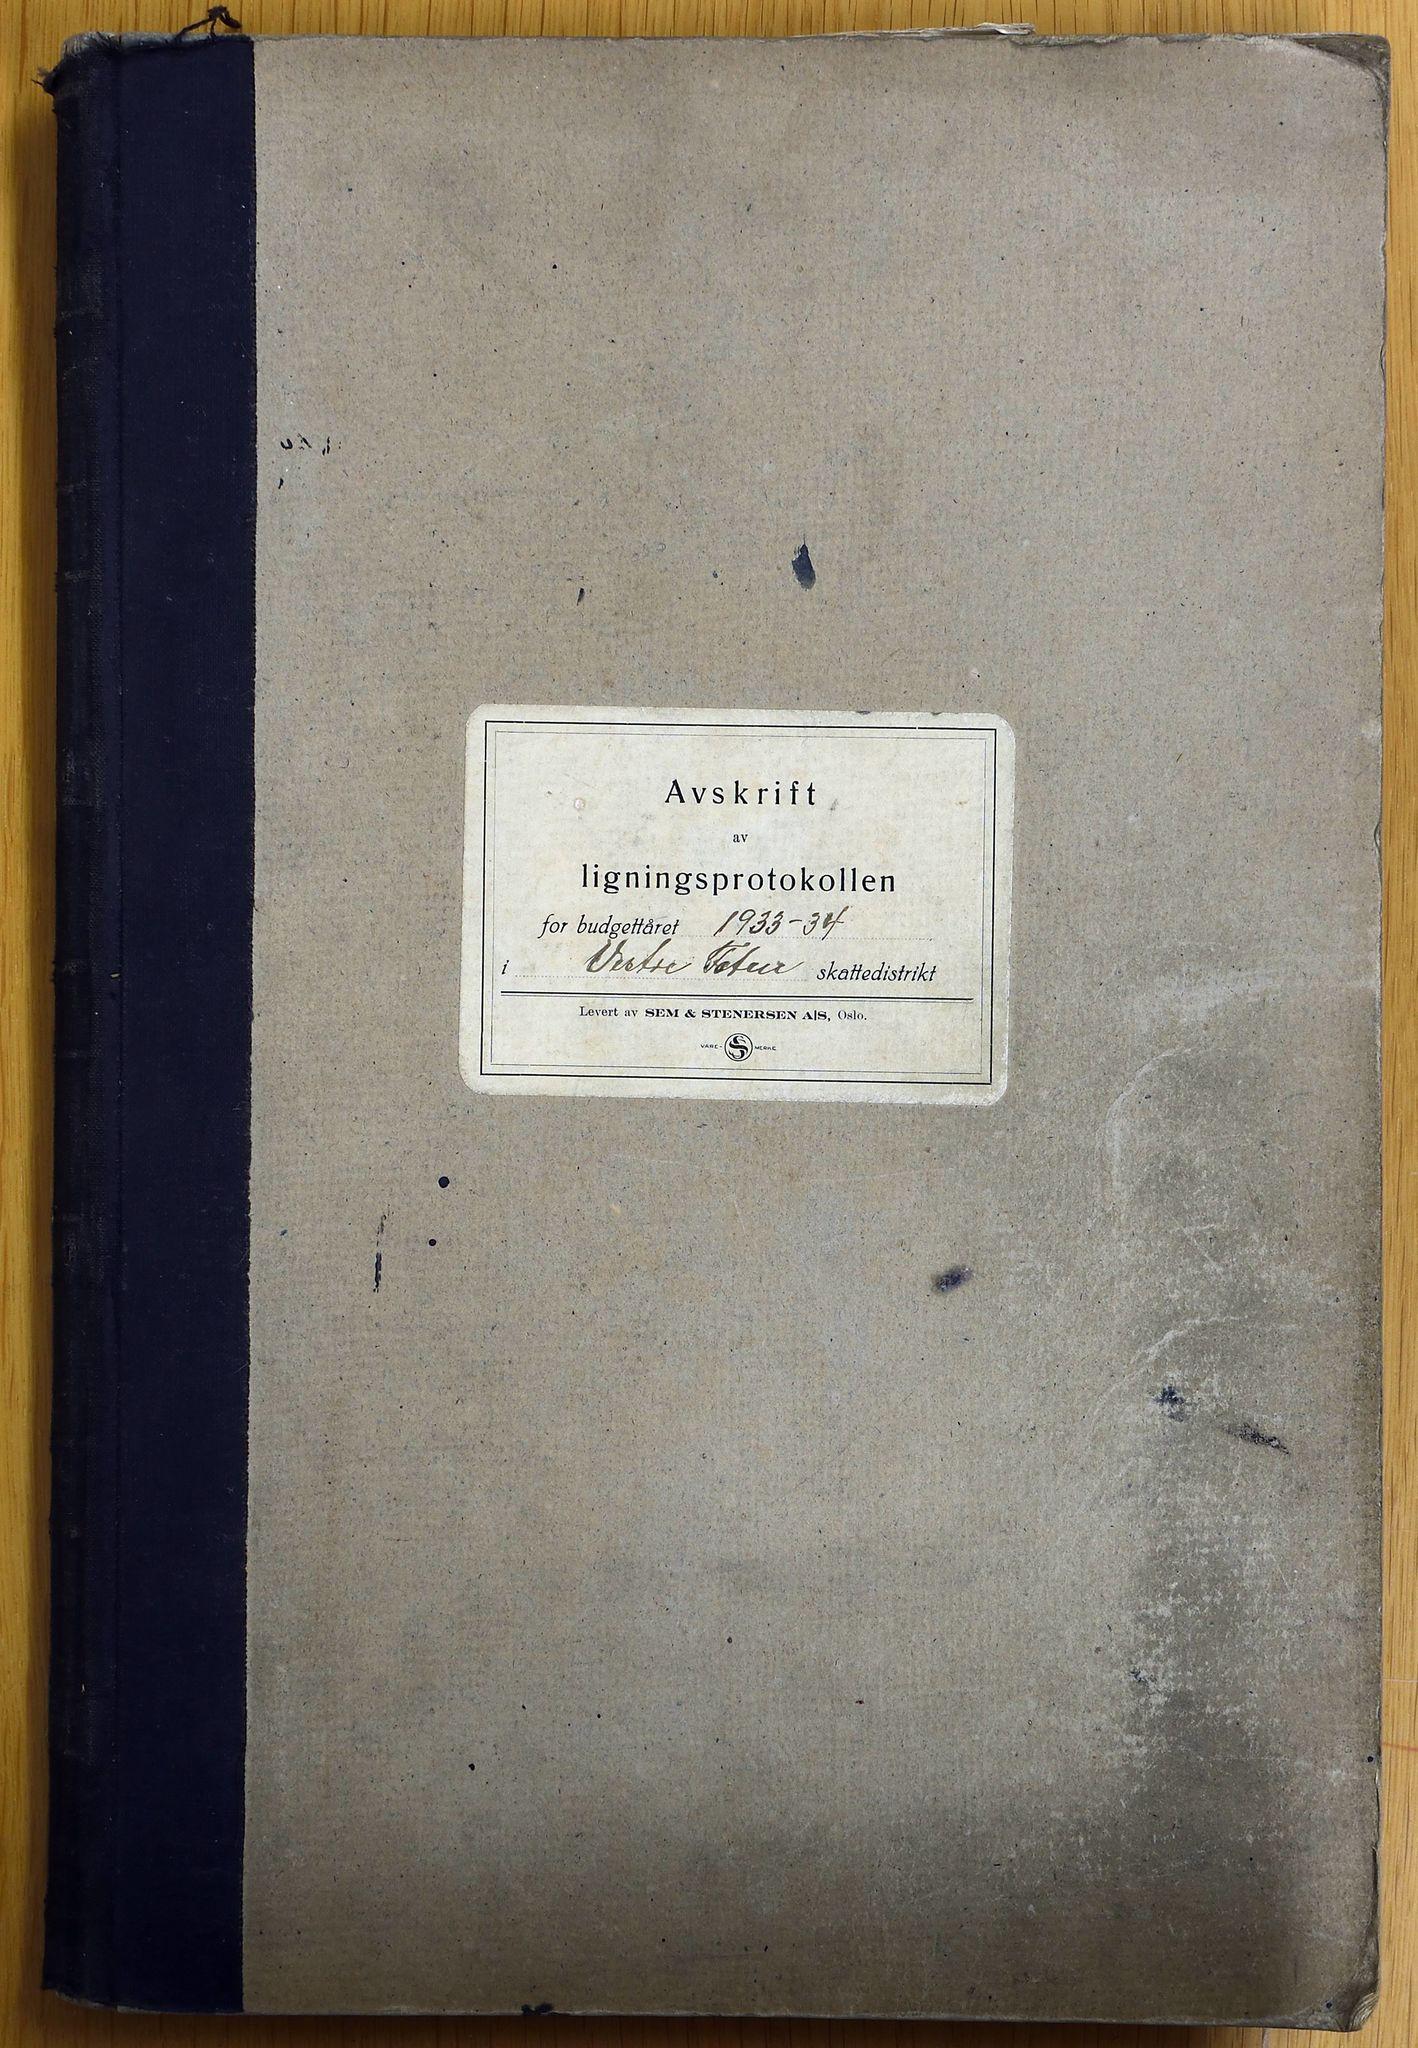 KVT, Vestre Toten municipality archive – Vestre Toten, Tax assessment protocol 1933-1934, 1933-1934